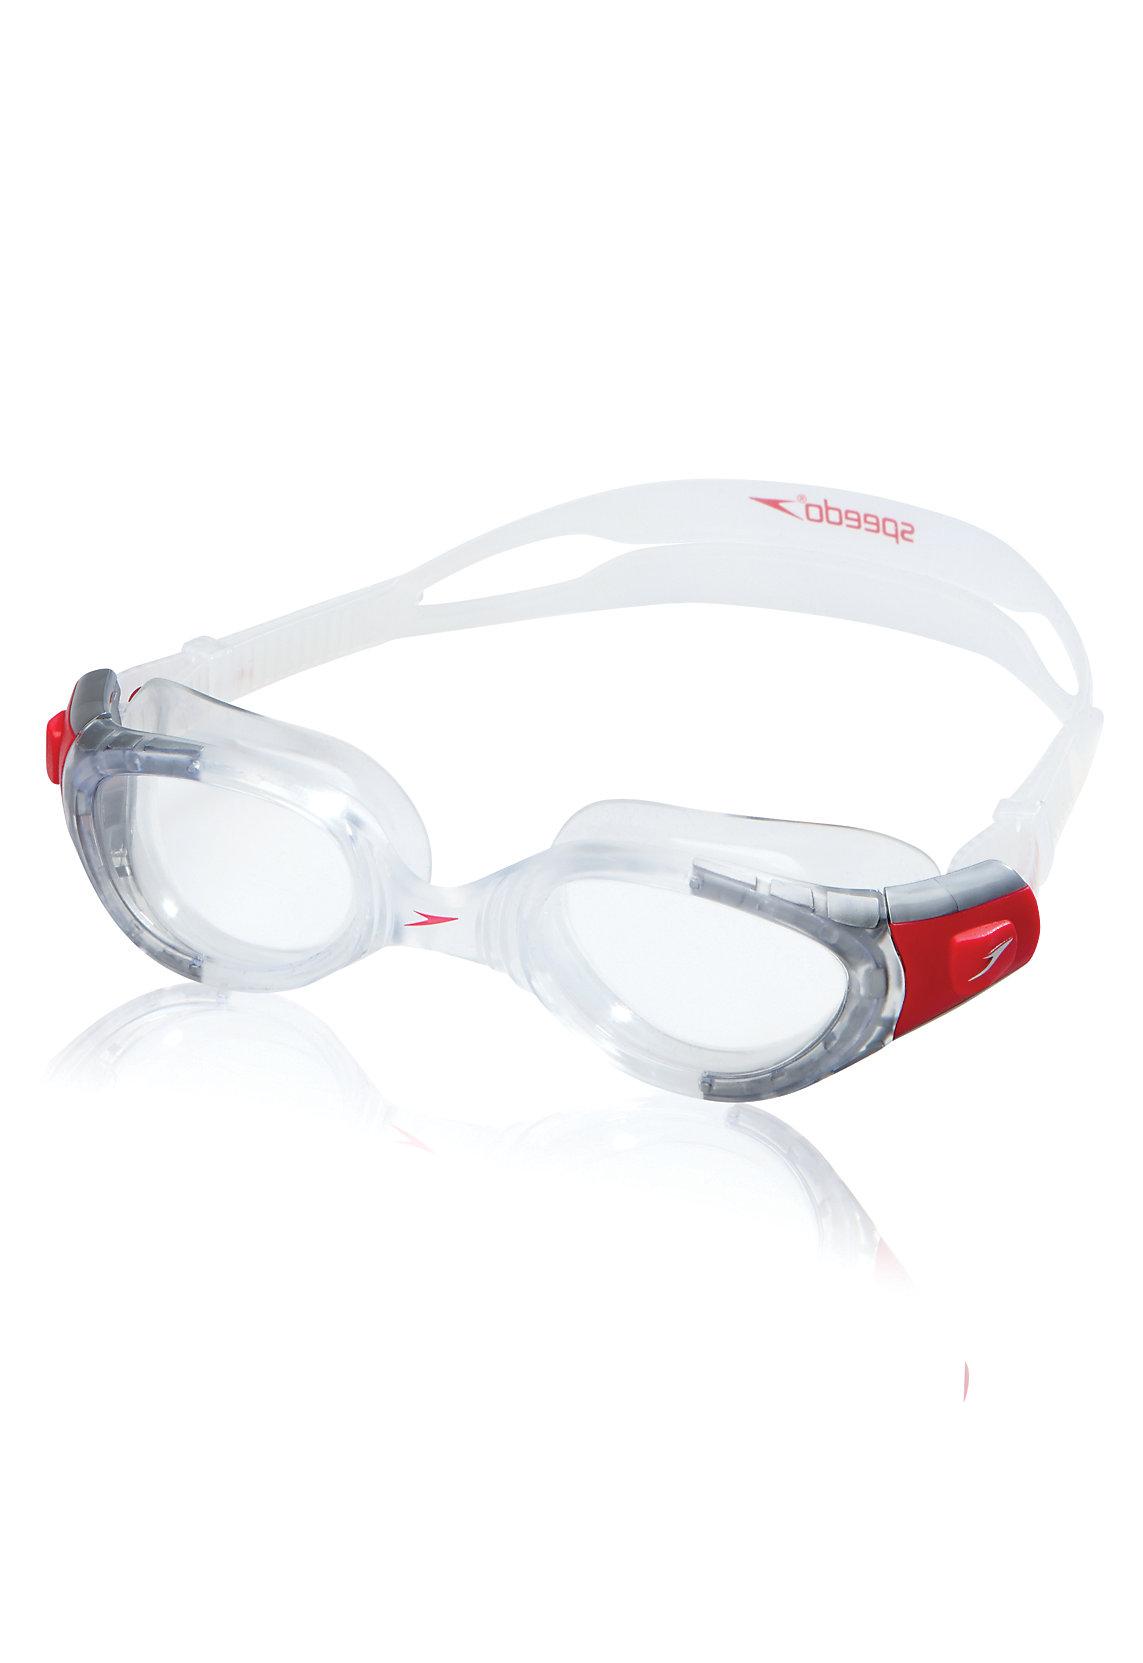 anti fog goggles  anti-fog performance